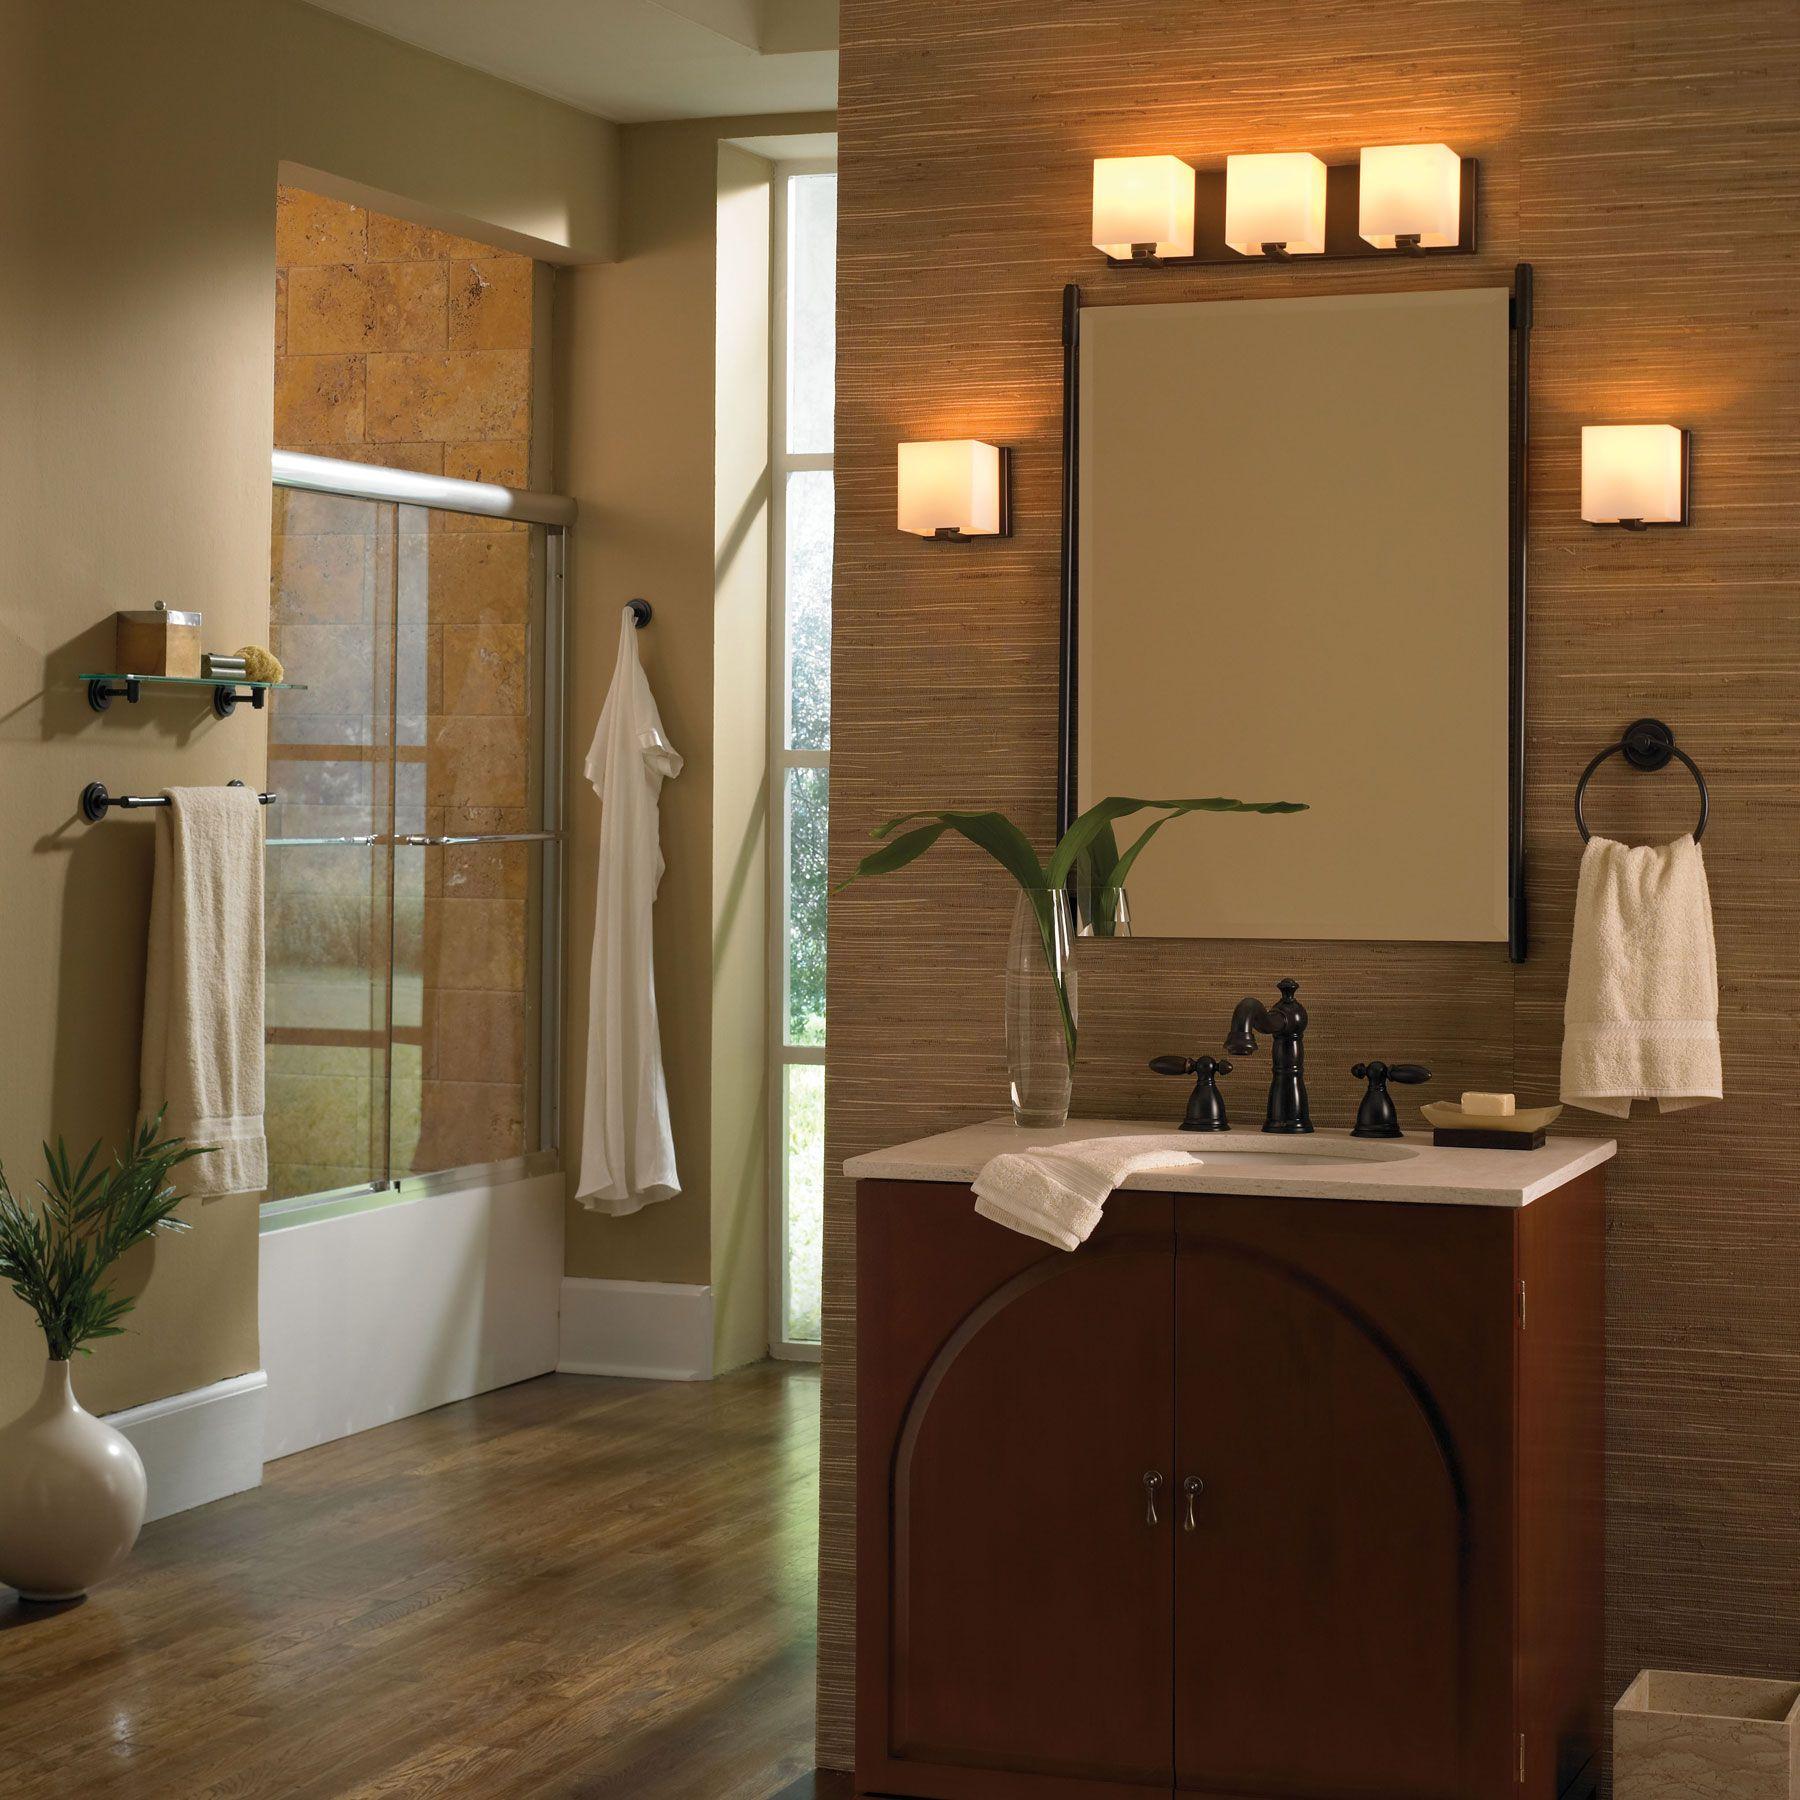 Houzz Bathroom Lighting Fixtures: Borg Vanity Wall Sconce